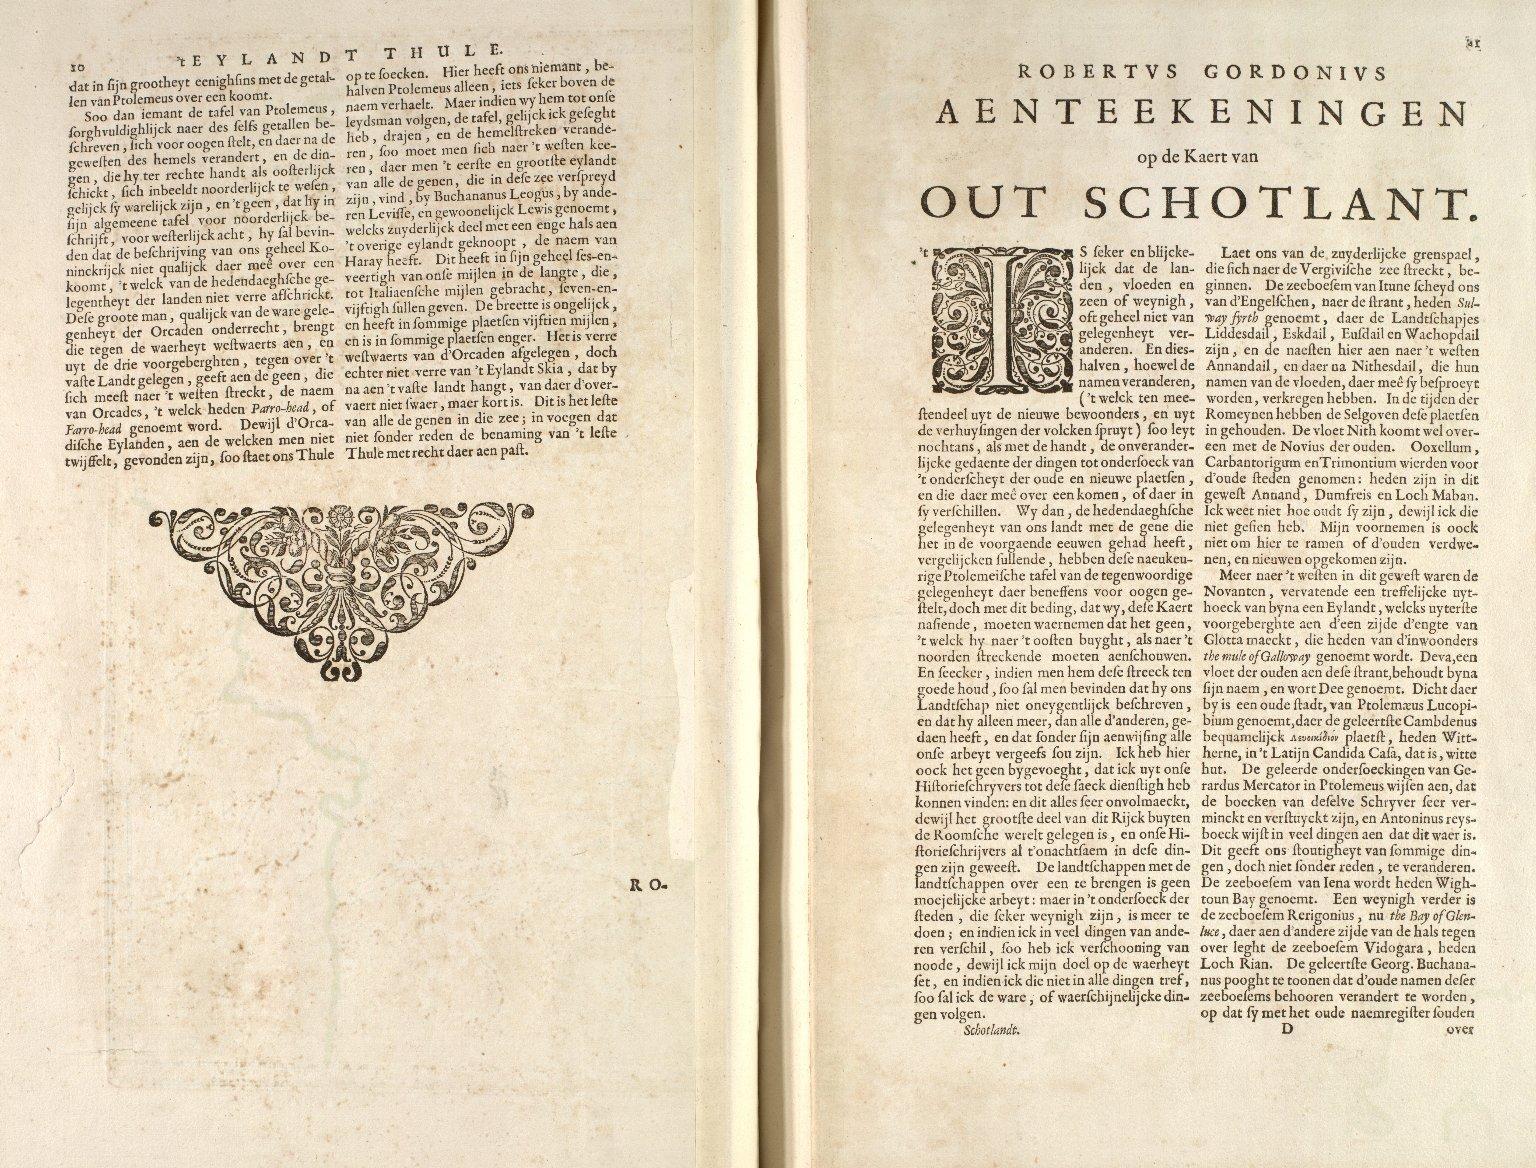 [Geographiae Blavianae] [Also known as: Atlas major] [014 of 153]